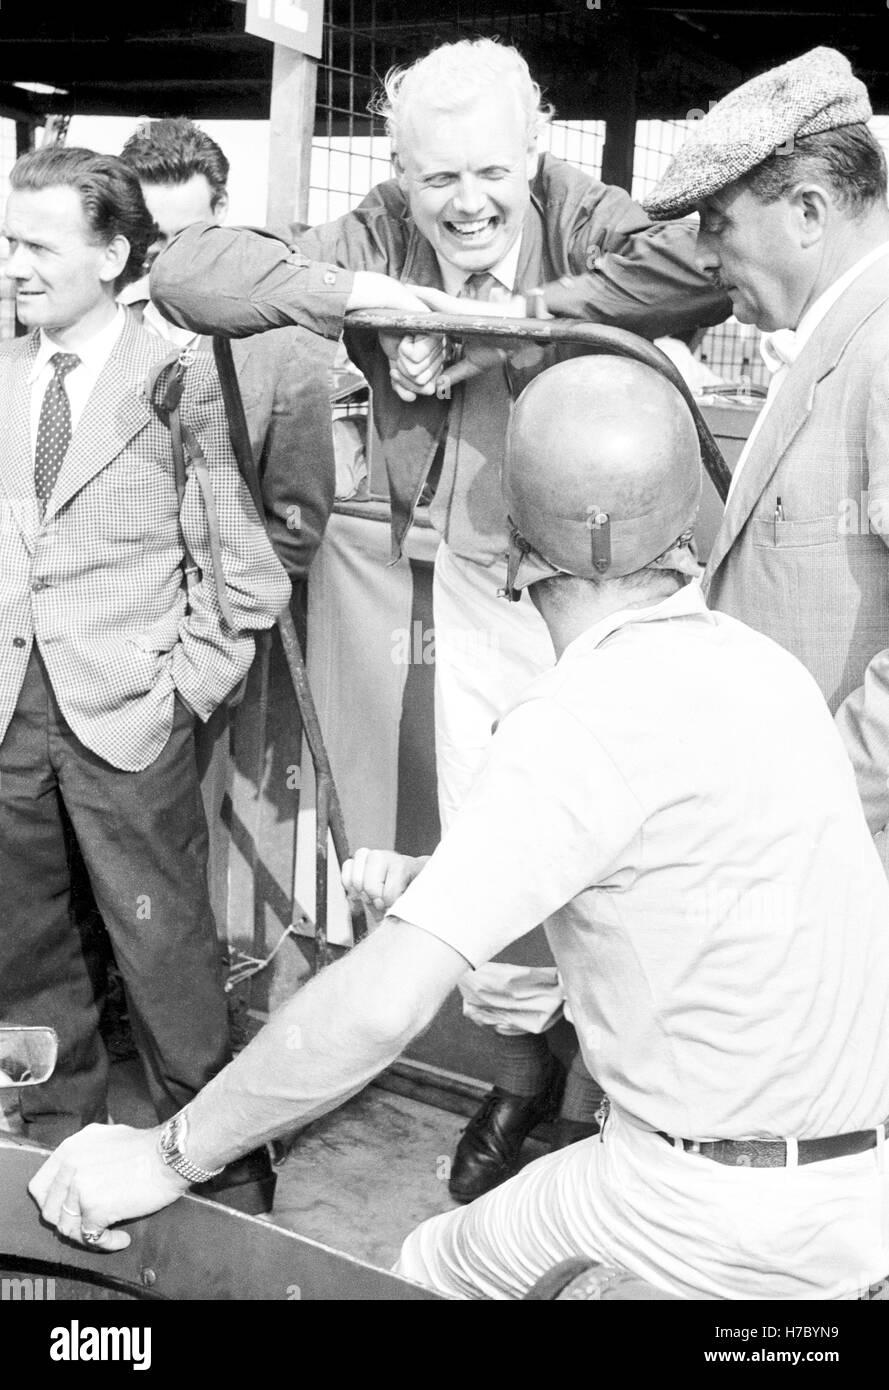 1957 Mike Hawthorn British motor racing driver Aintree pits UK - Stock Image